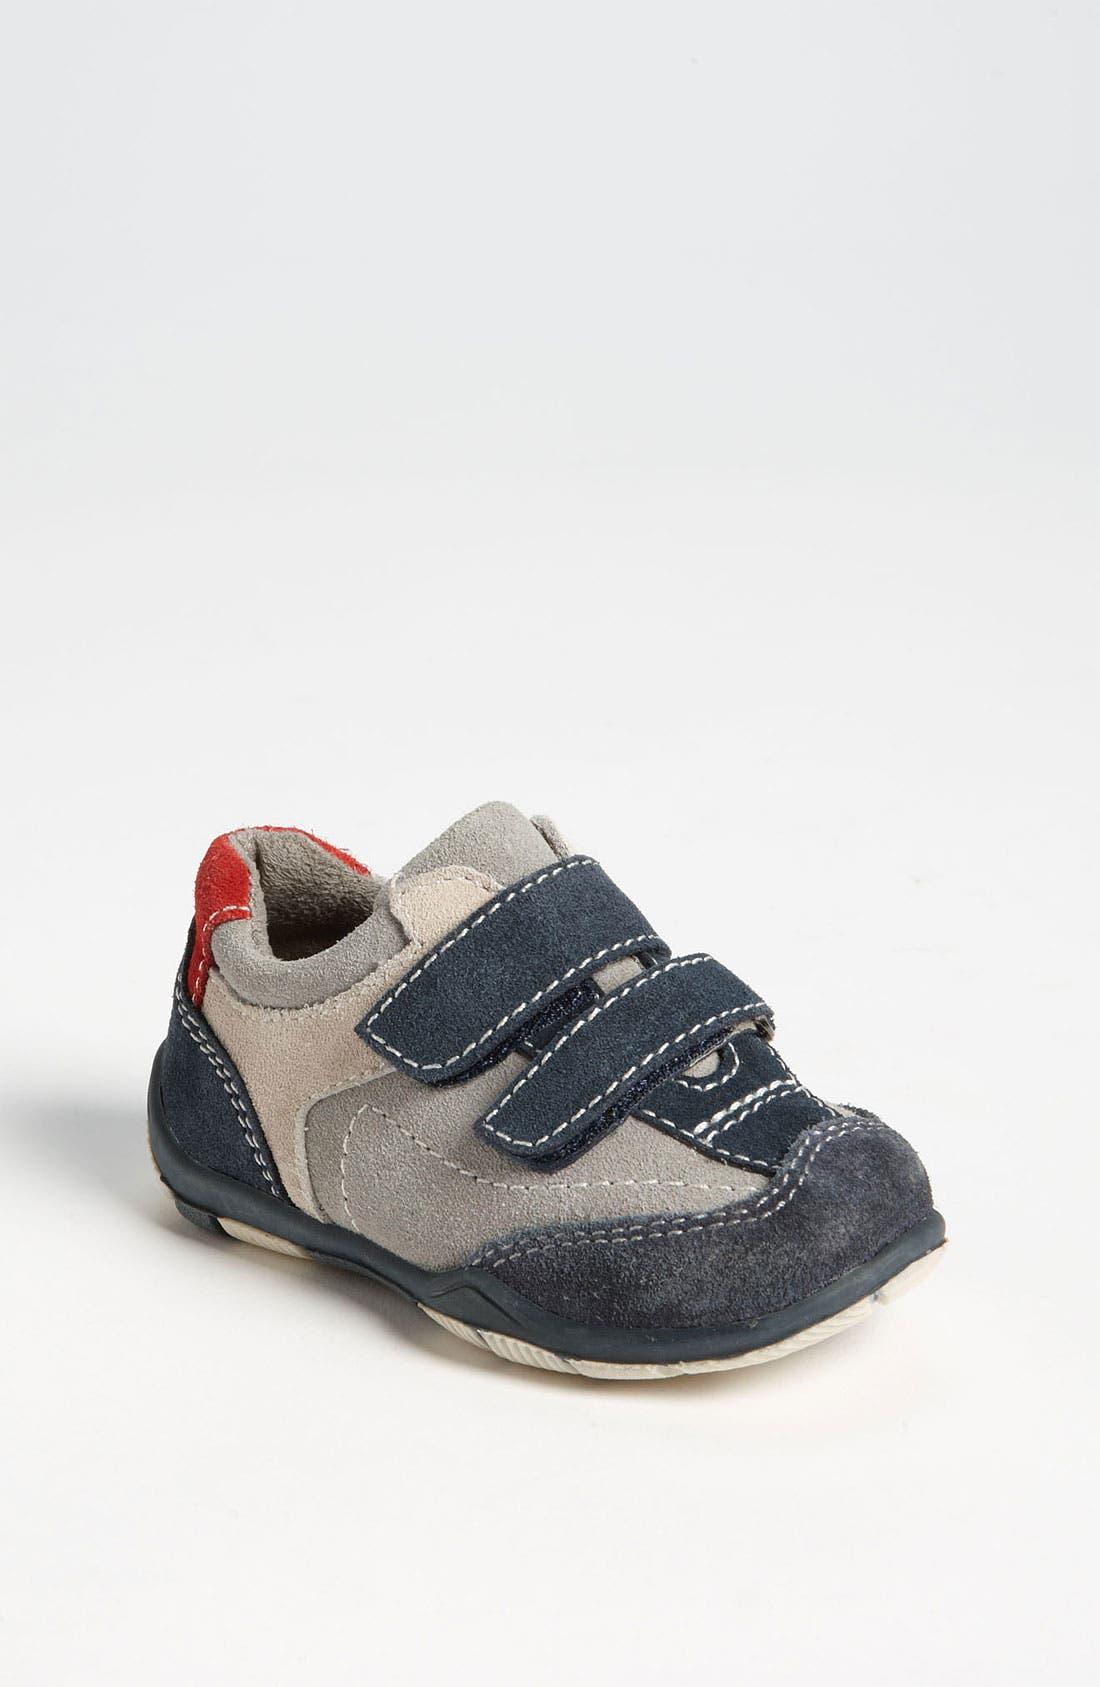 Main Image - Cole Haan 'Air Conner' Sneaker (Walker & Toddler)